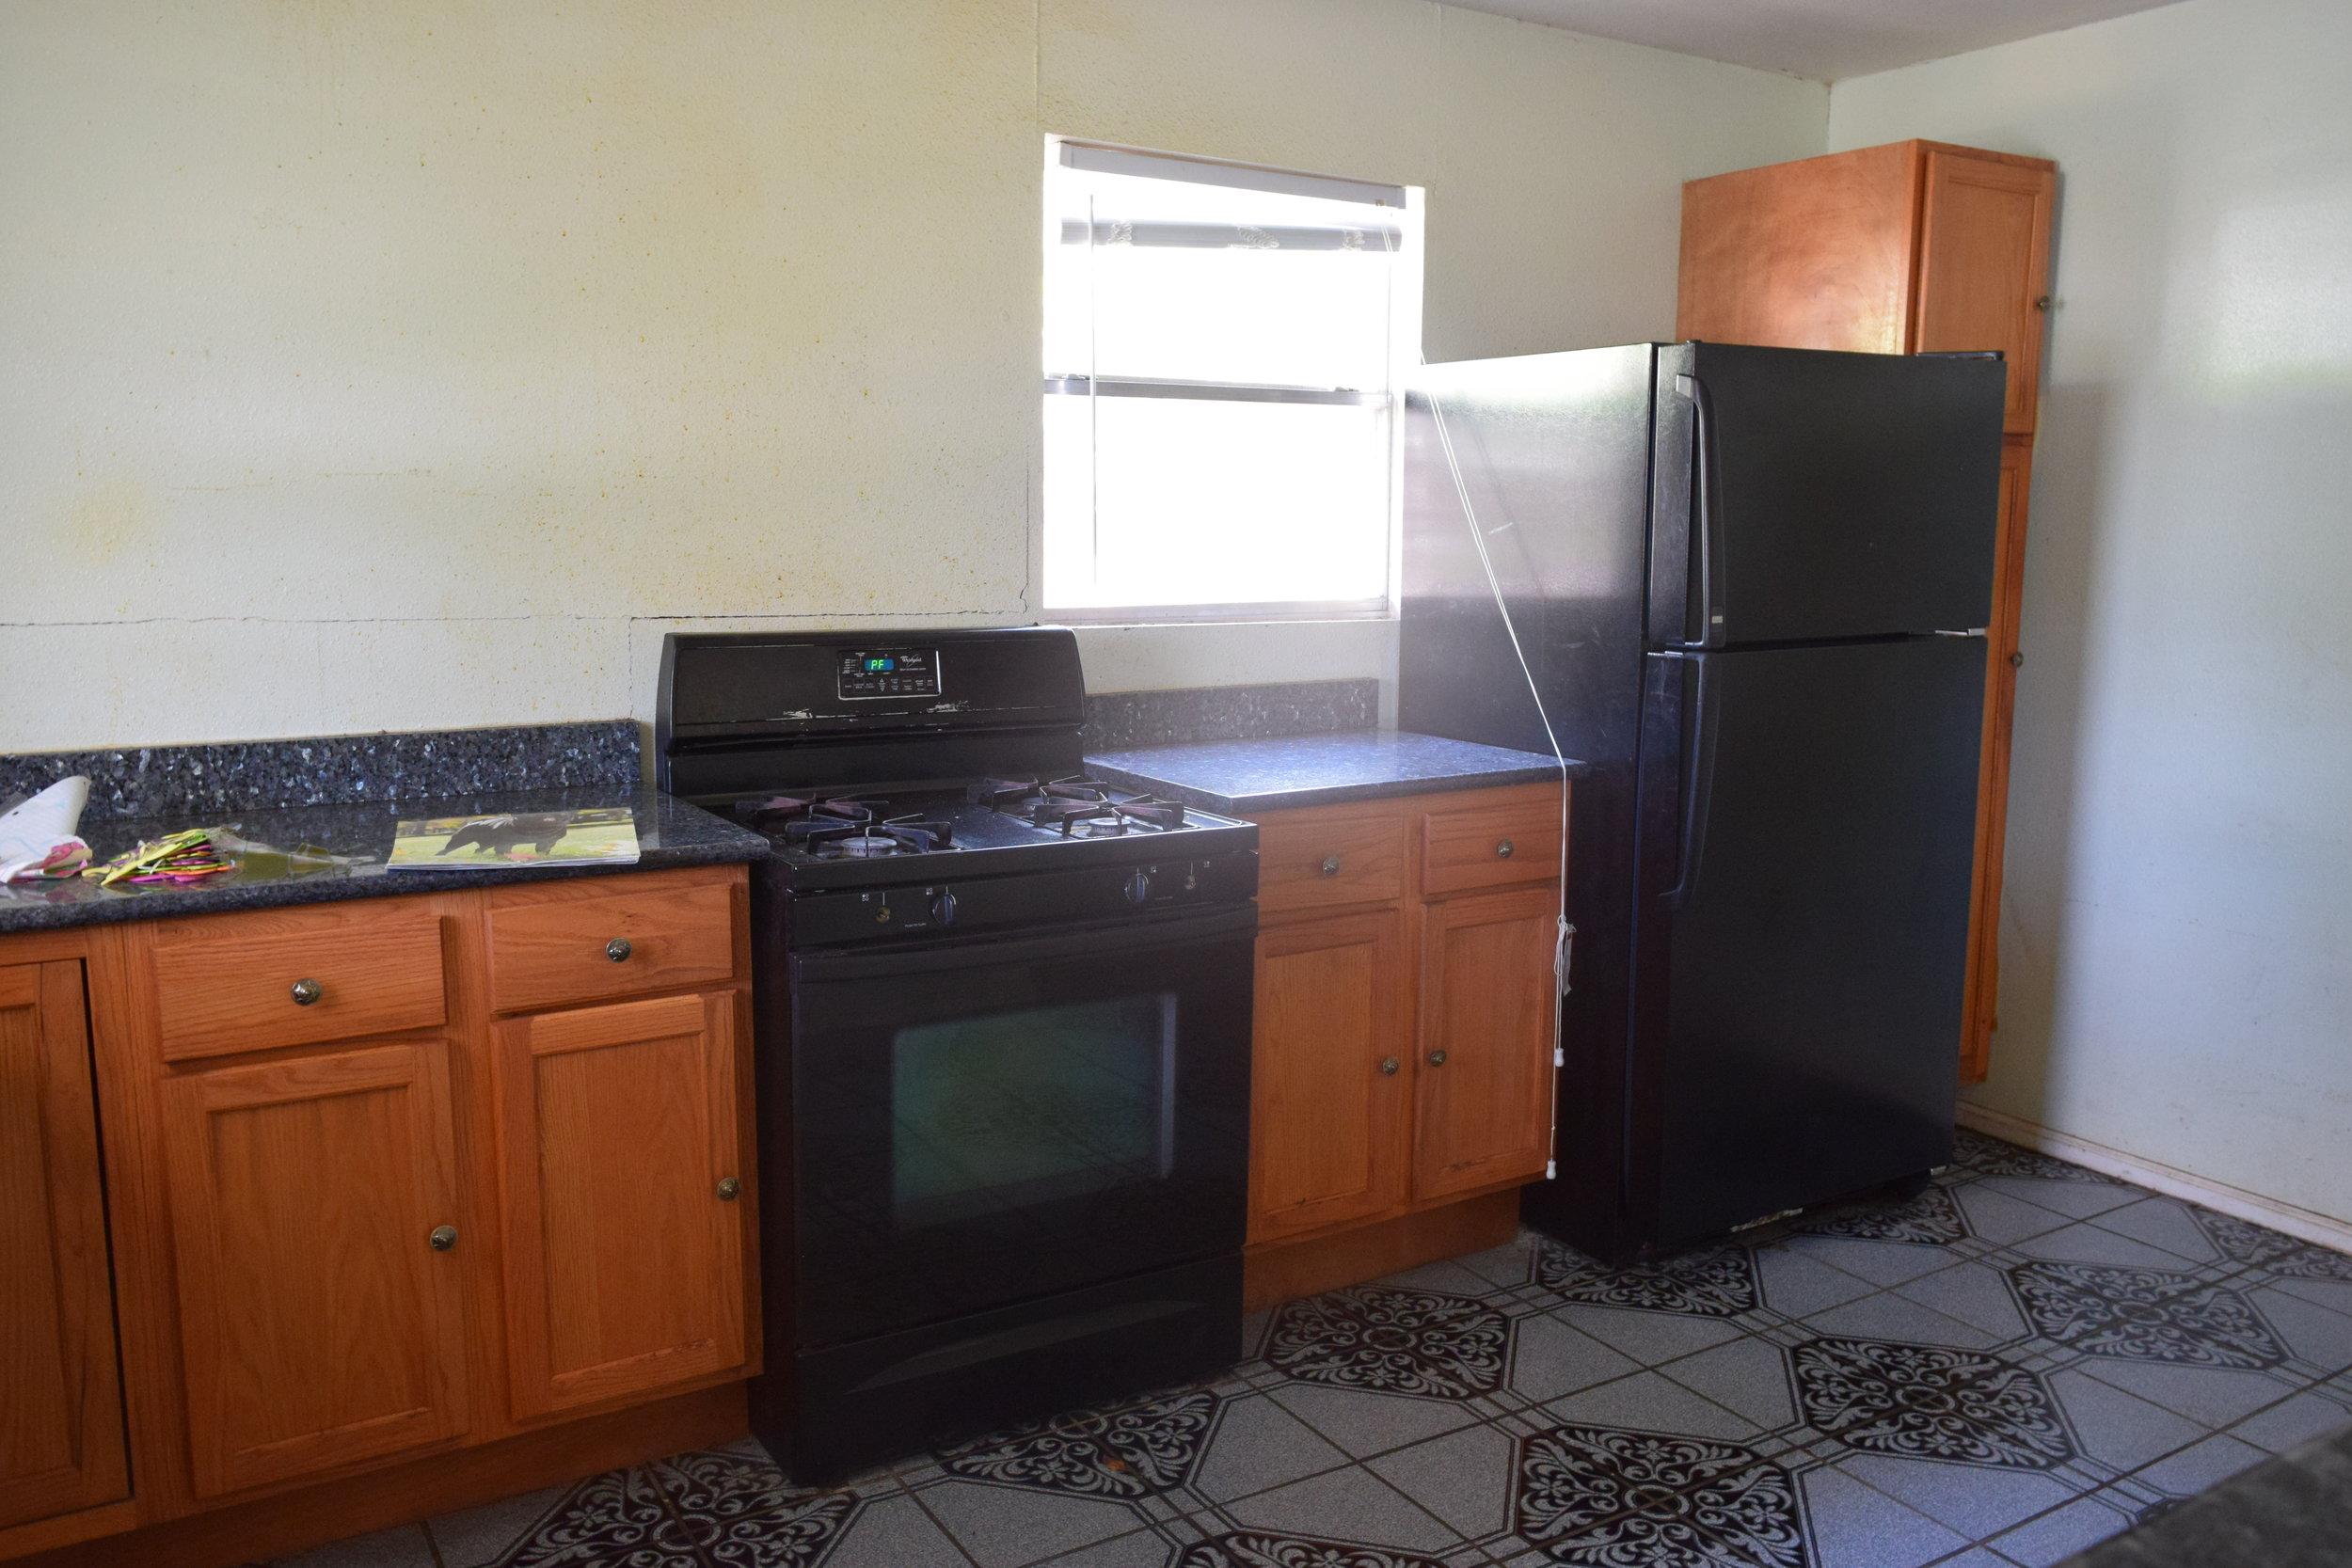 tiny-rehab-kitchen-before-4.jpg